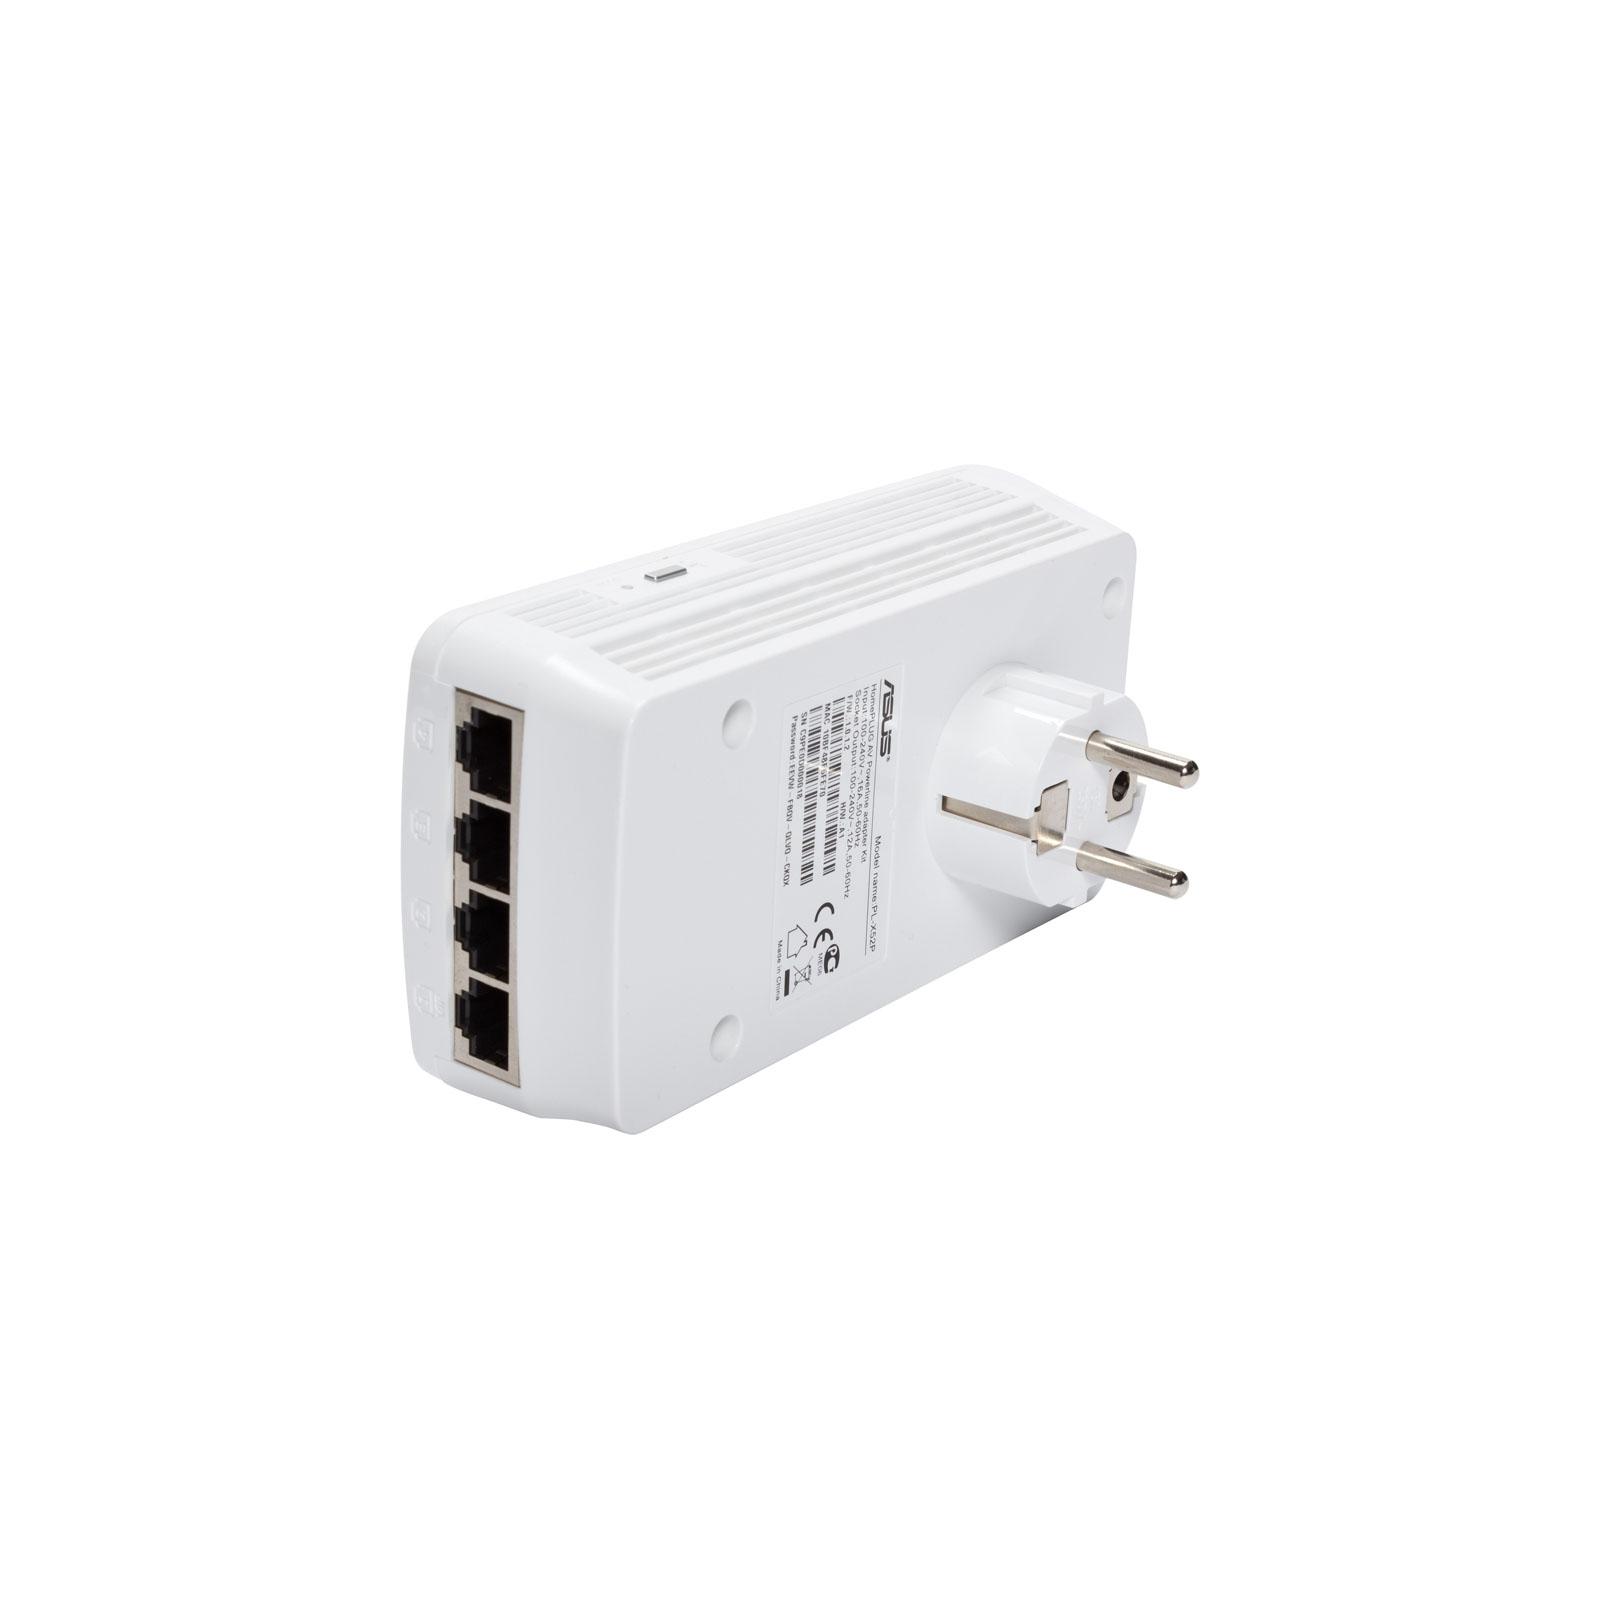 Адаптер PoE ASUS PL-X52P изображение 4